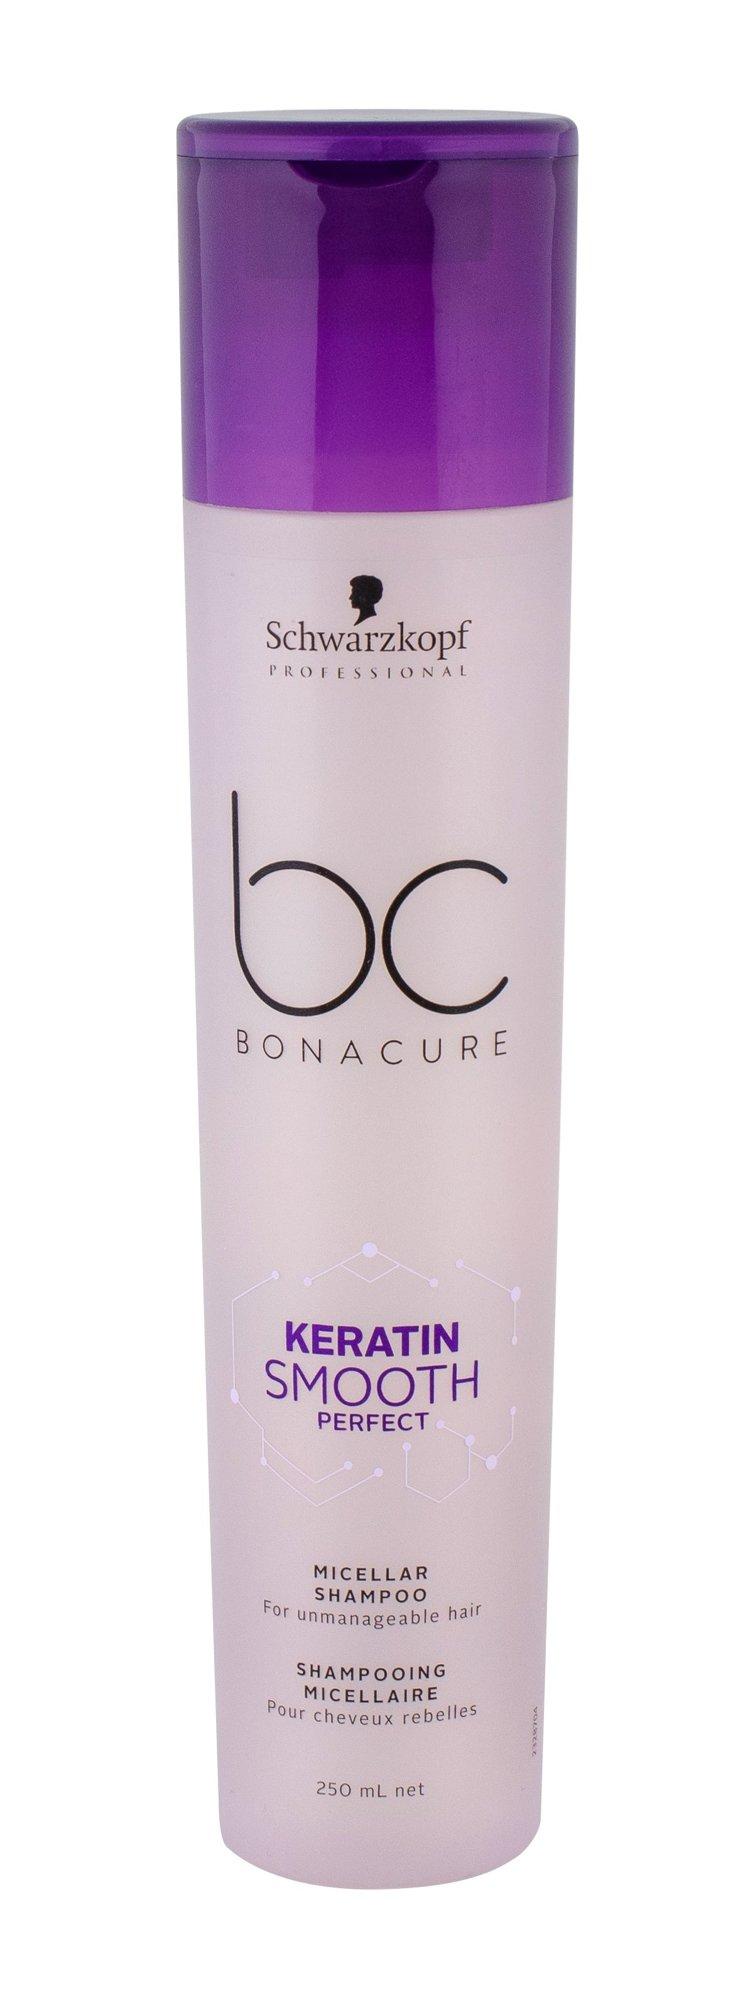 Schwarzkopf BC Bonacure Keratin Smooth Perfect Shampoo 250ml